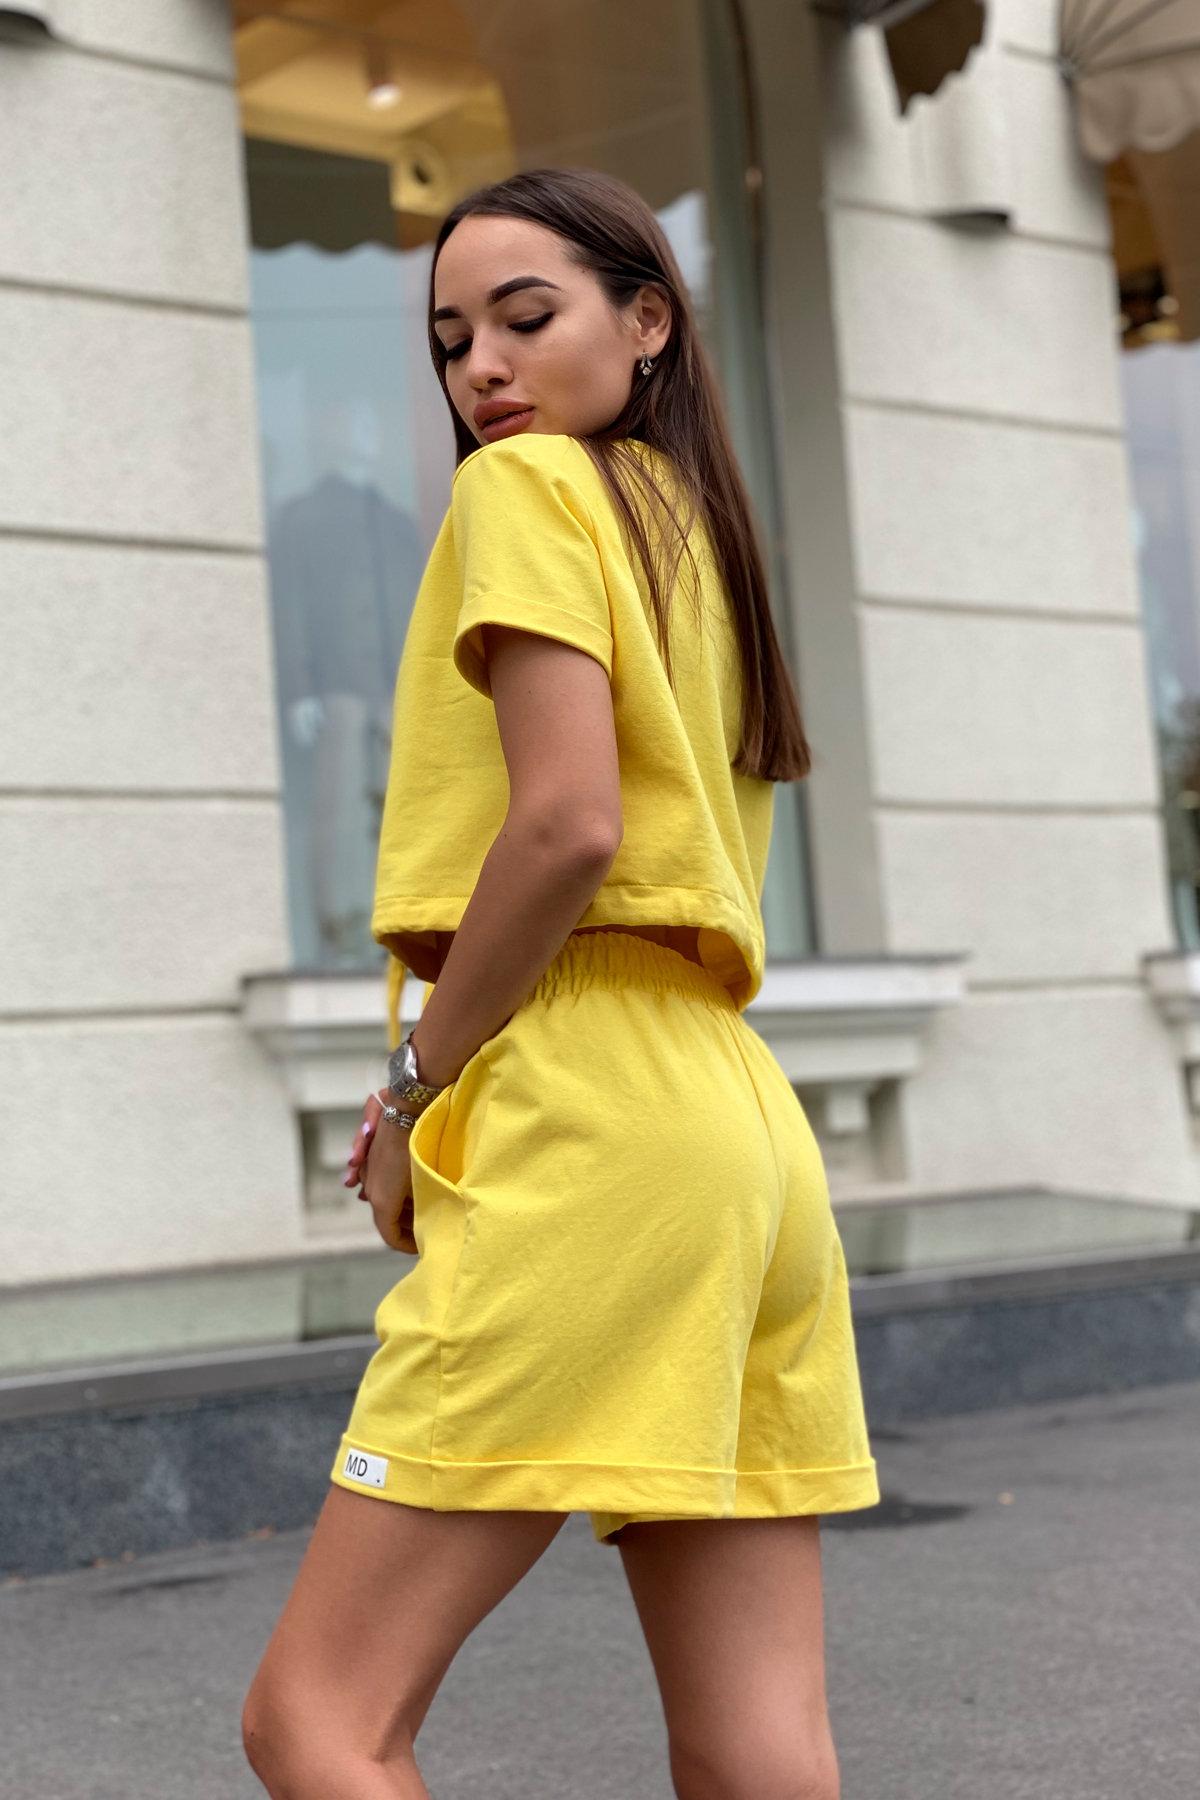 Костюм Фреш 9252 АРТ. 45823 Цвет: Желтый - фото 3, интернет магазин tm-modus.ru